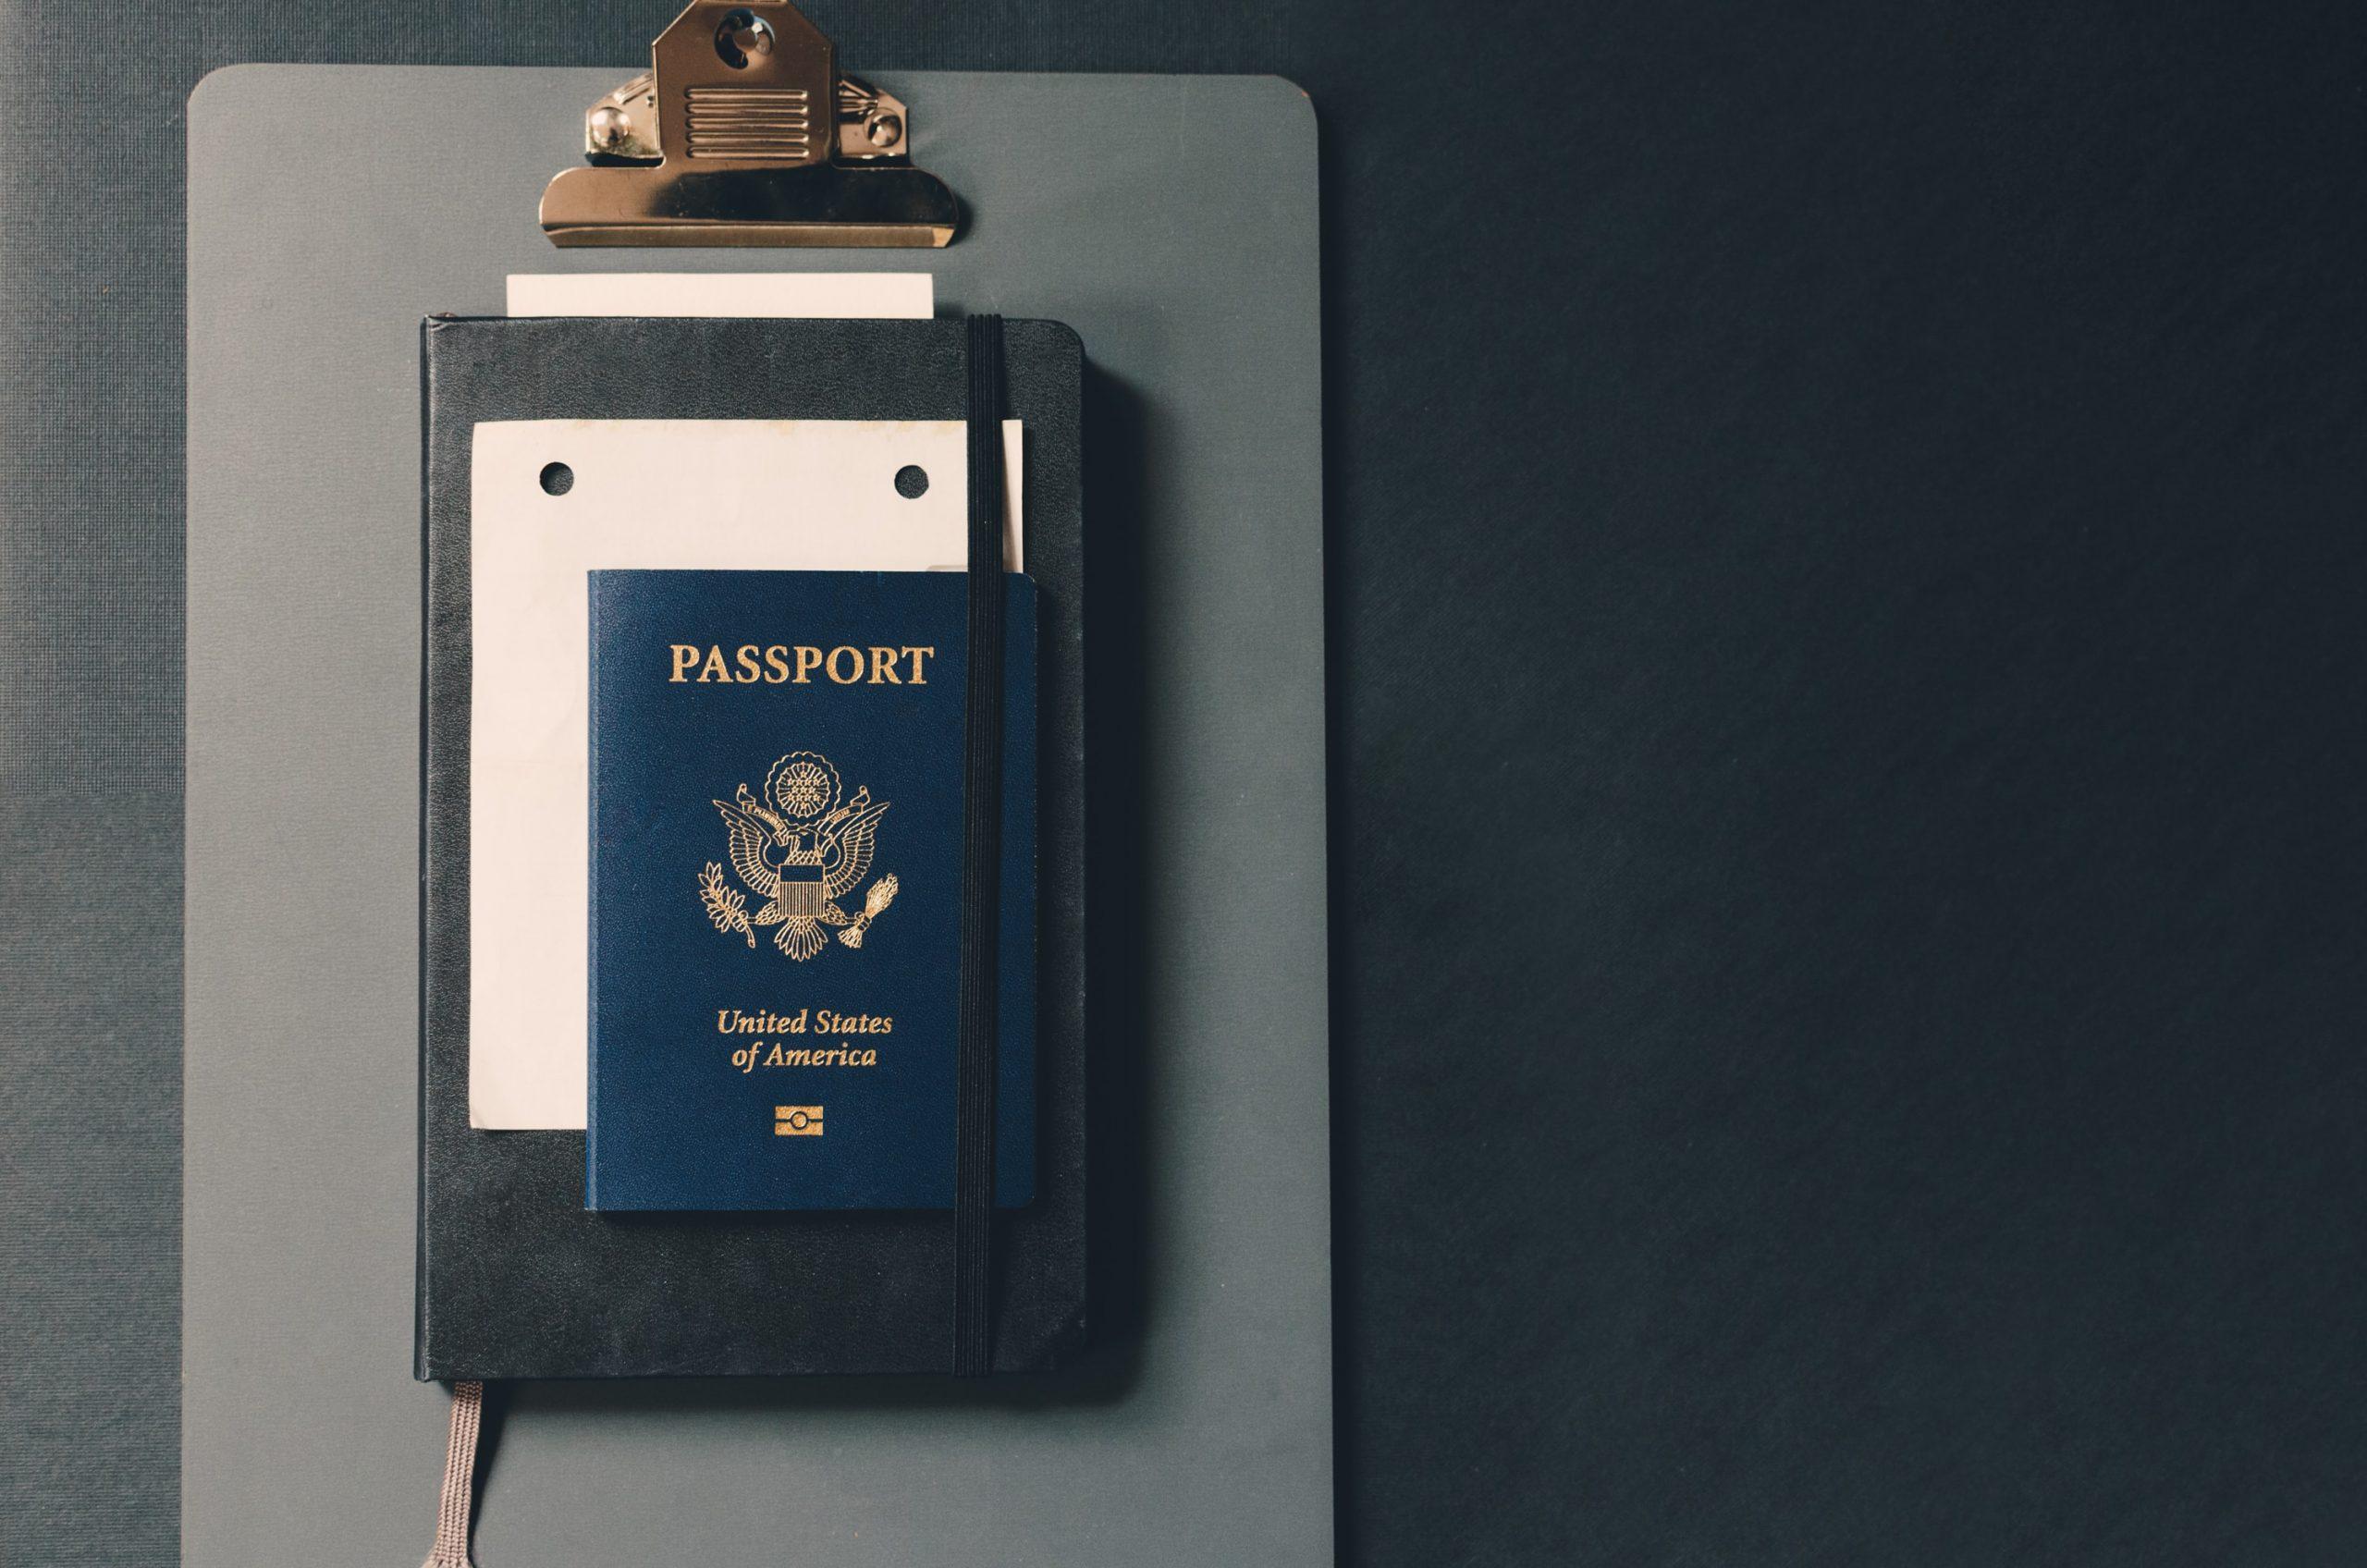 US Passport By Kelly Sikkema [unsplash]